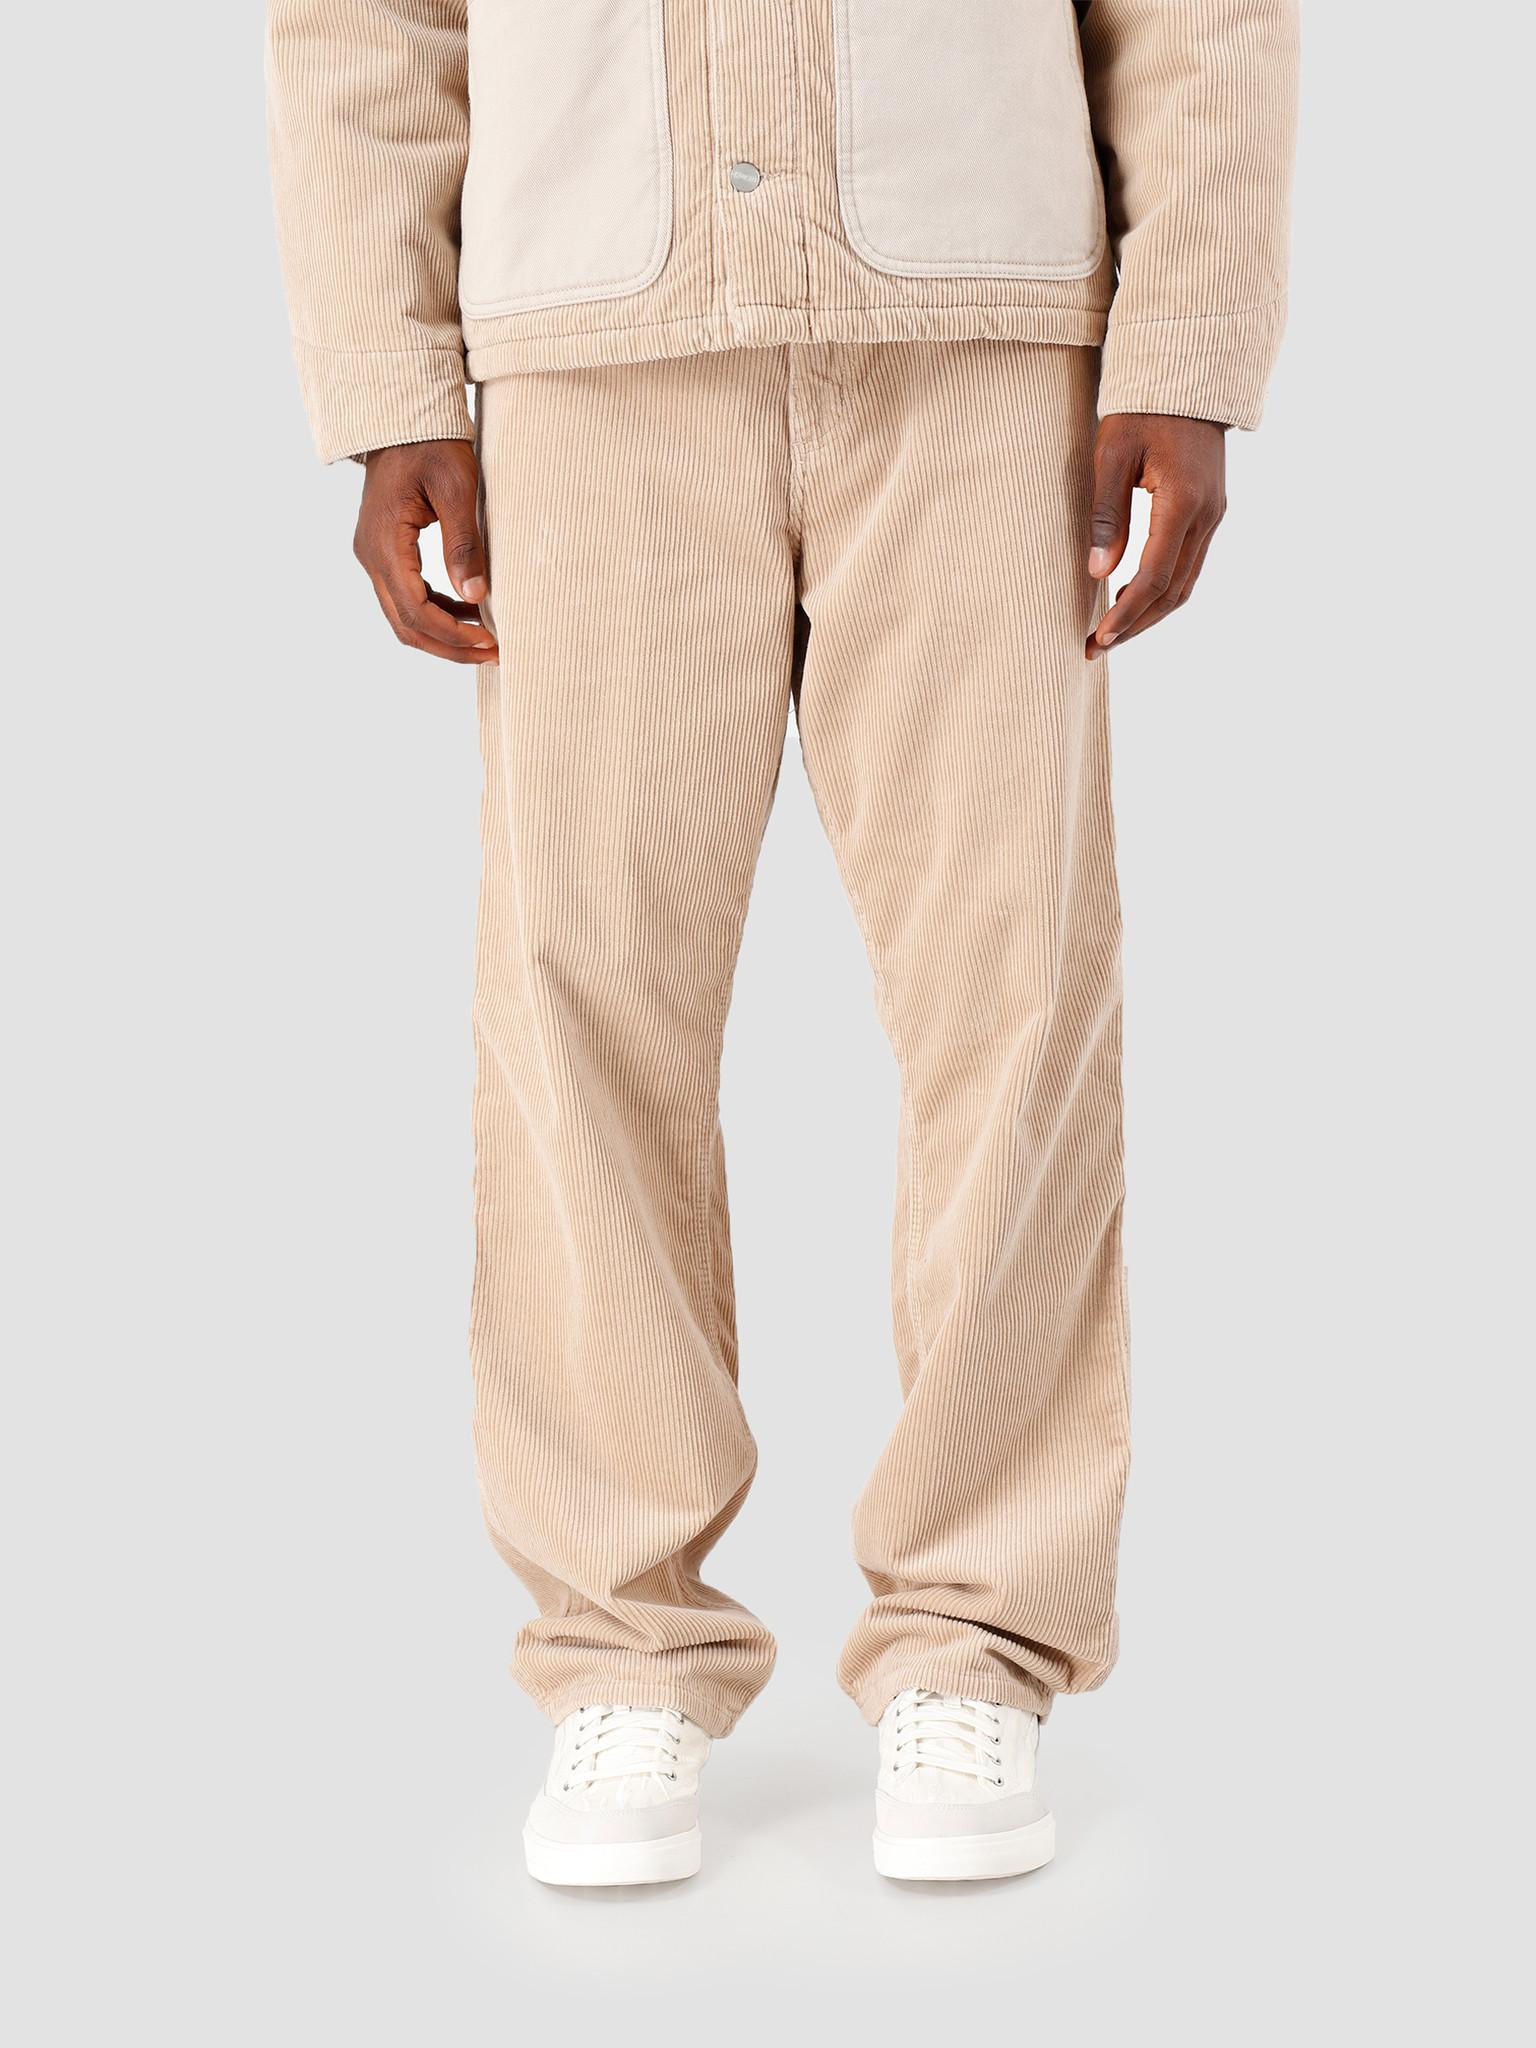 Carhartt WIP Carhartt WIP Single Knee Pant Wall I027211